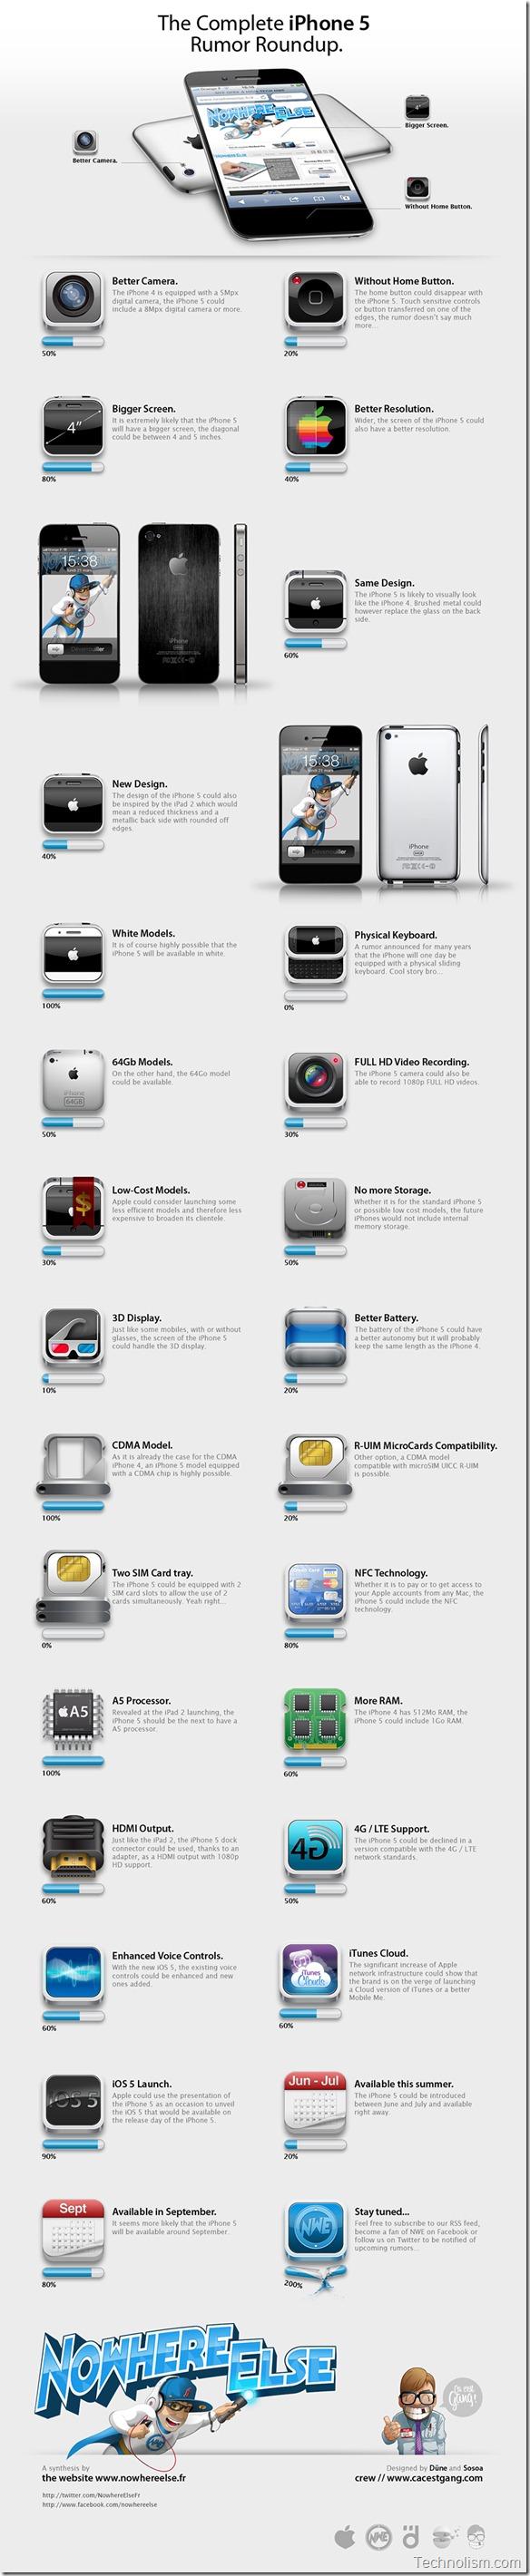 iPhone-5-Rumors-Infographic